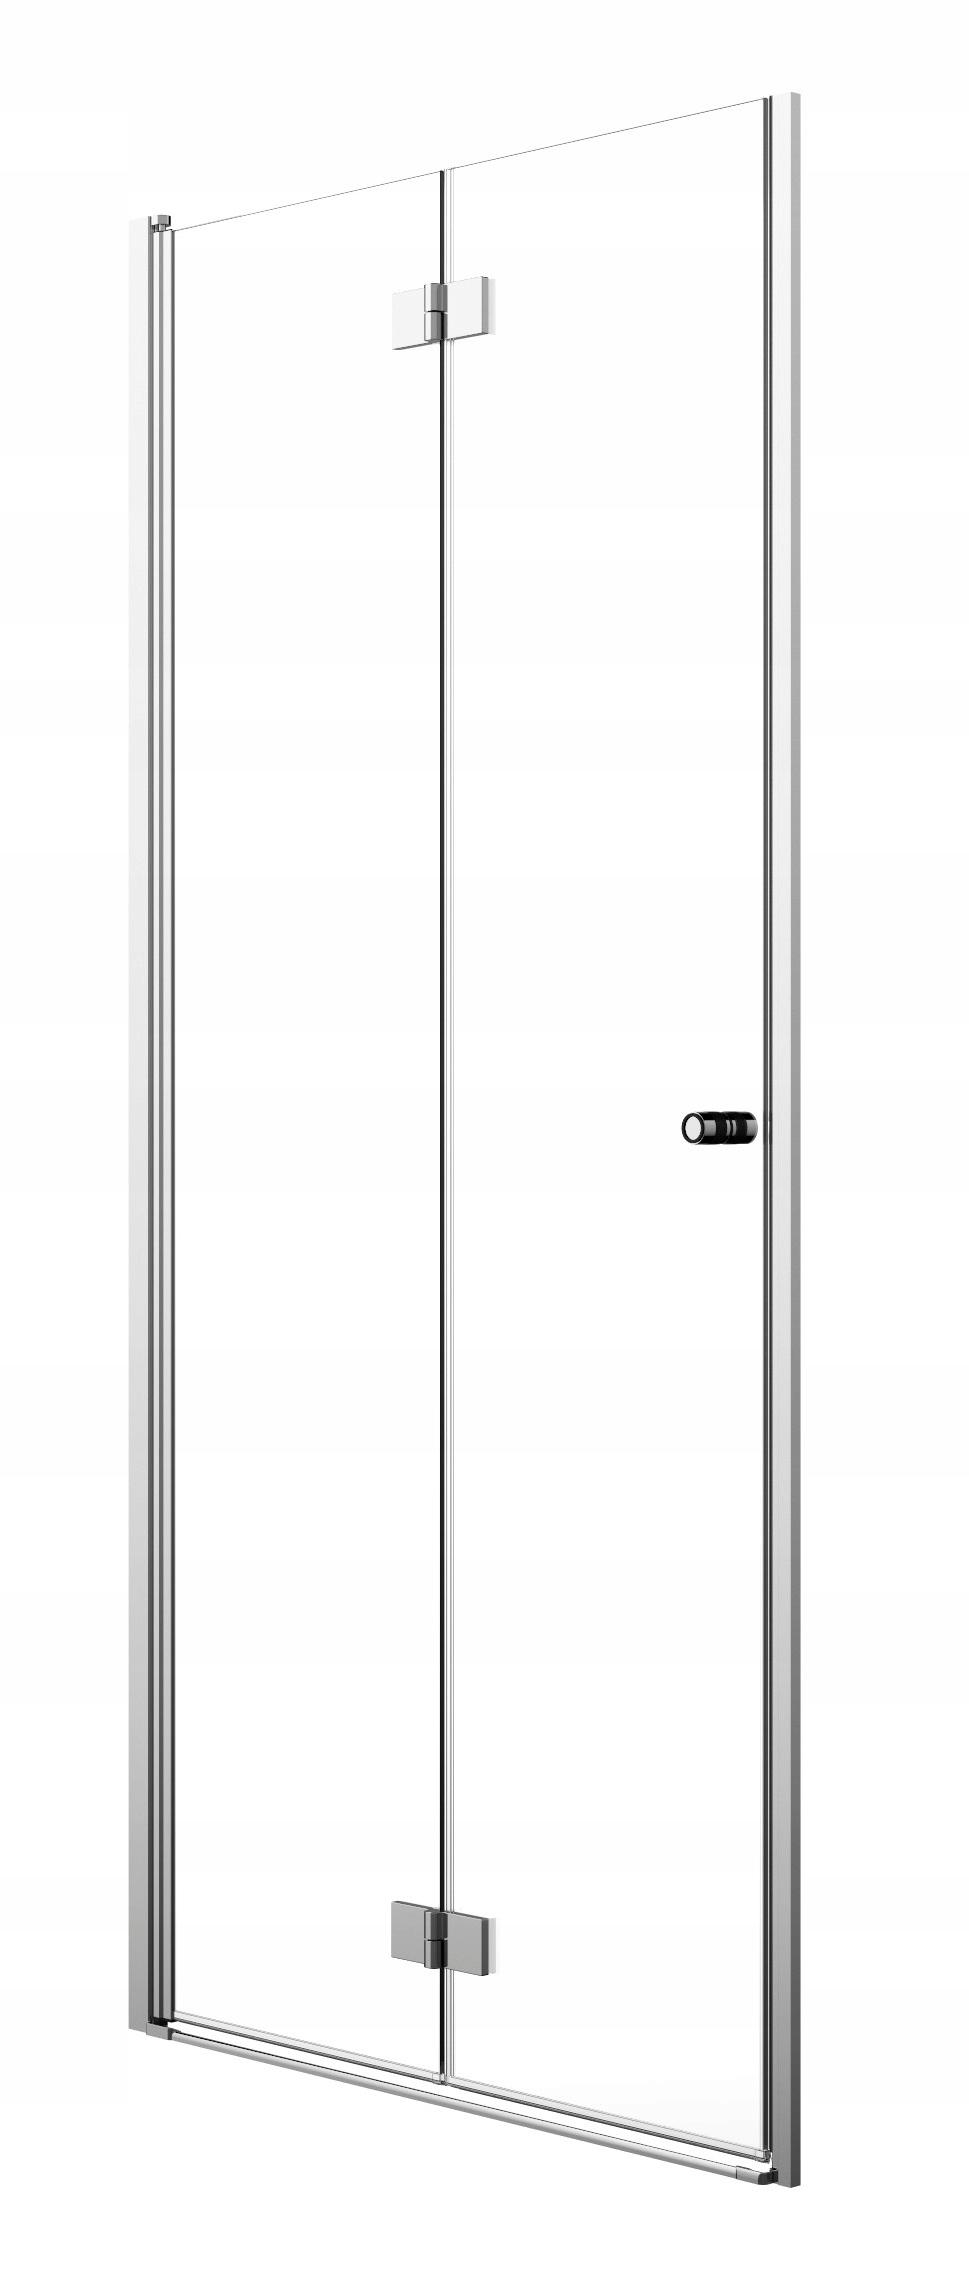 Essenza Nové sprchové dvere RADAWAY DxB 80x200